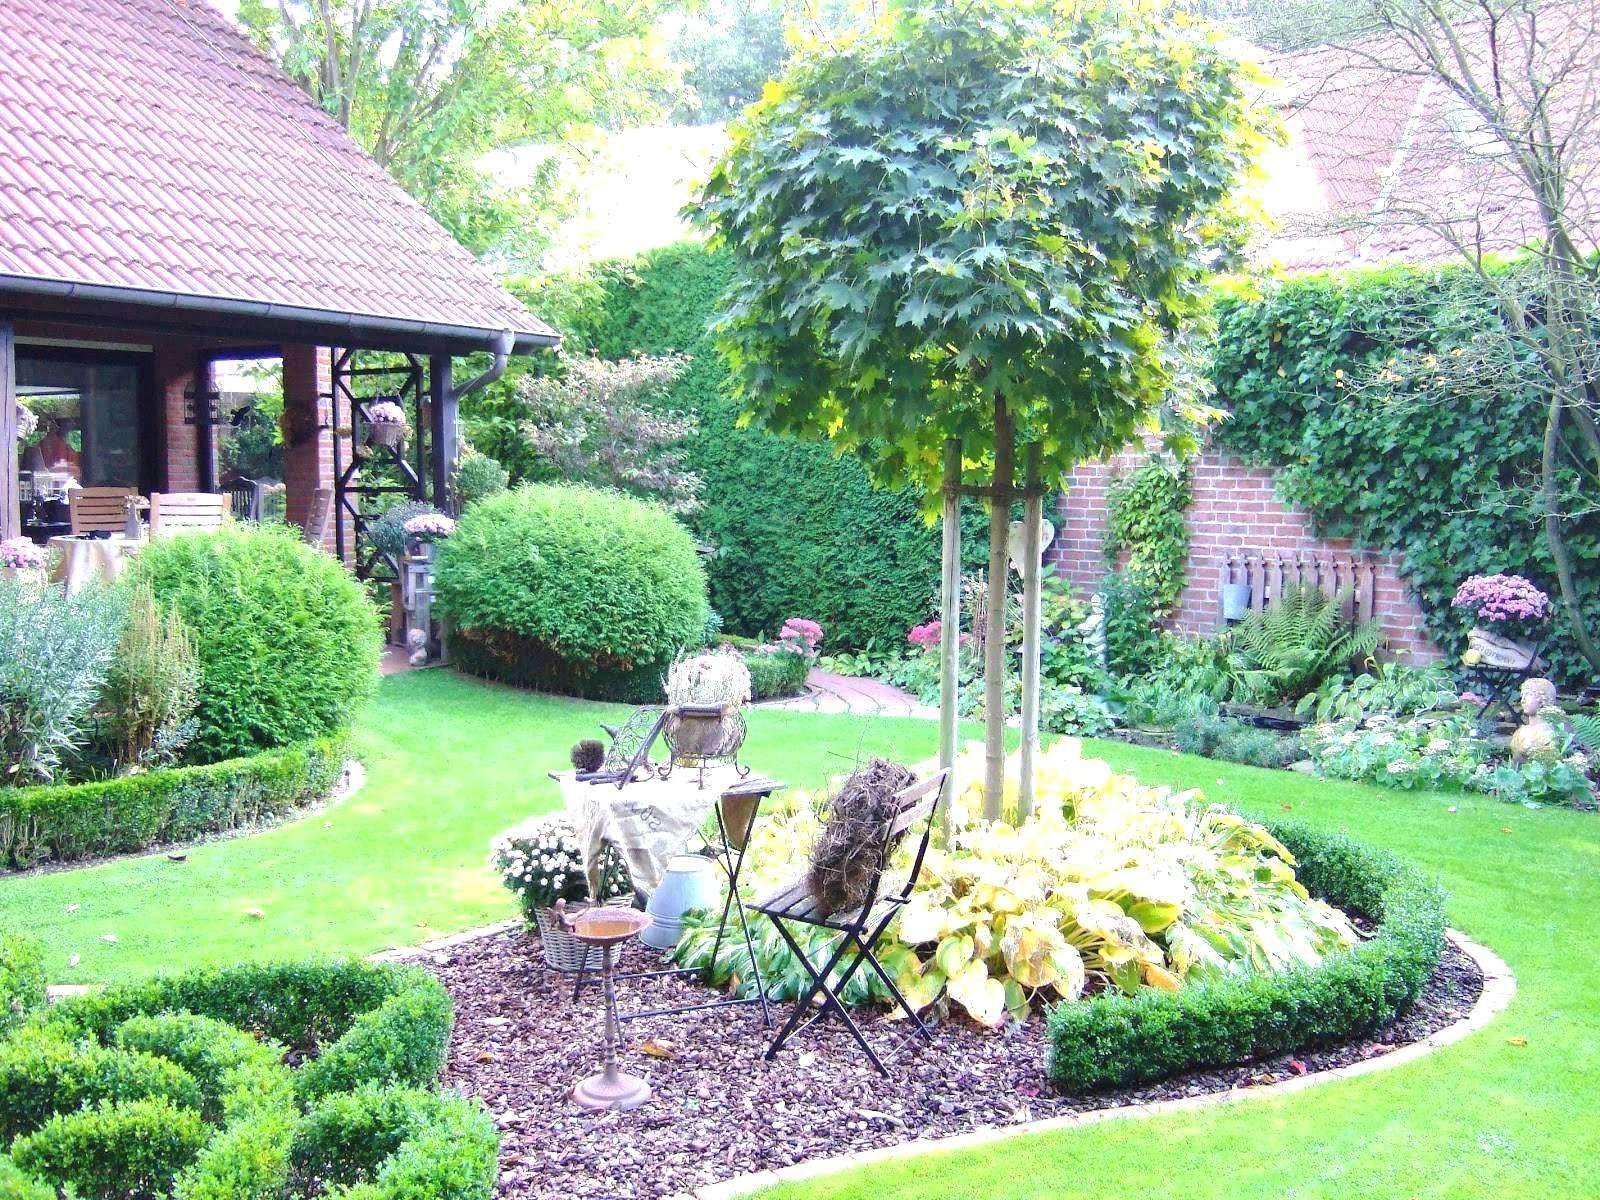 Garten Einrichten Einzigartig Garten Ideas Garten Anlegen Inspirational Aussenleuchten